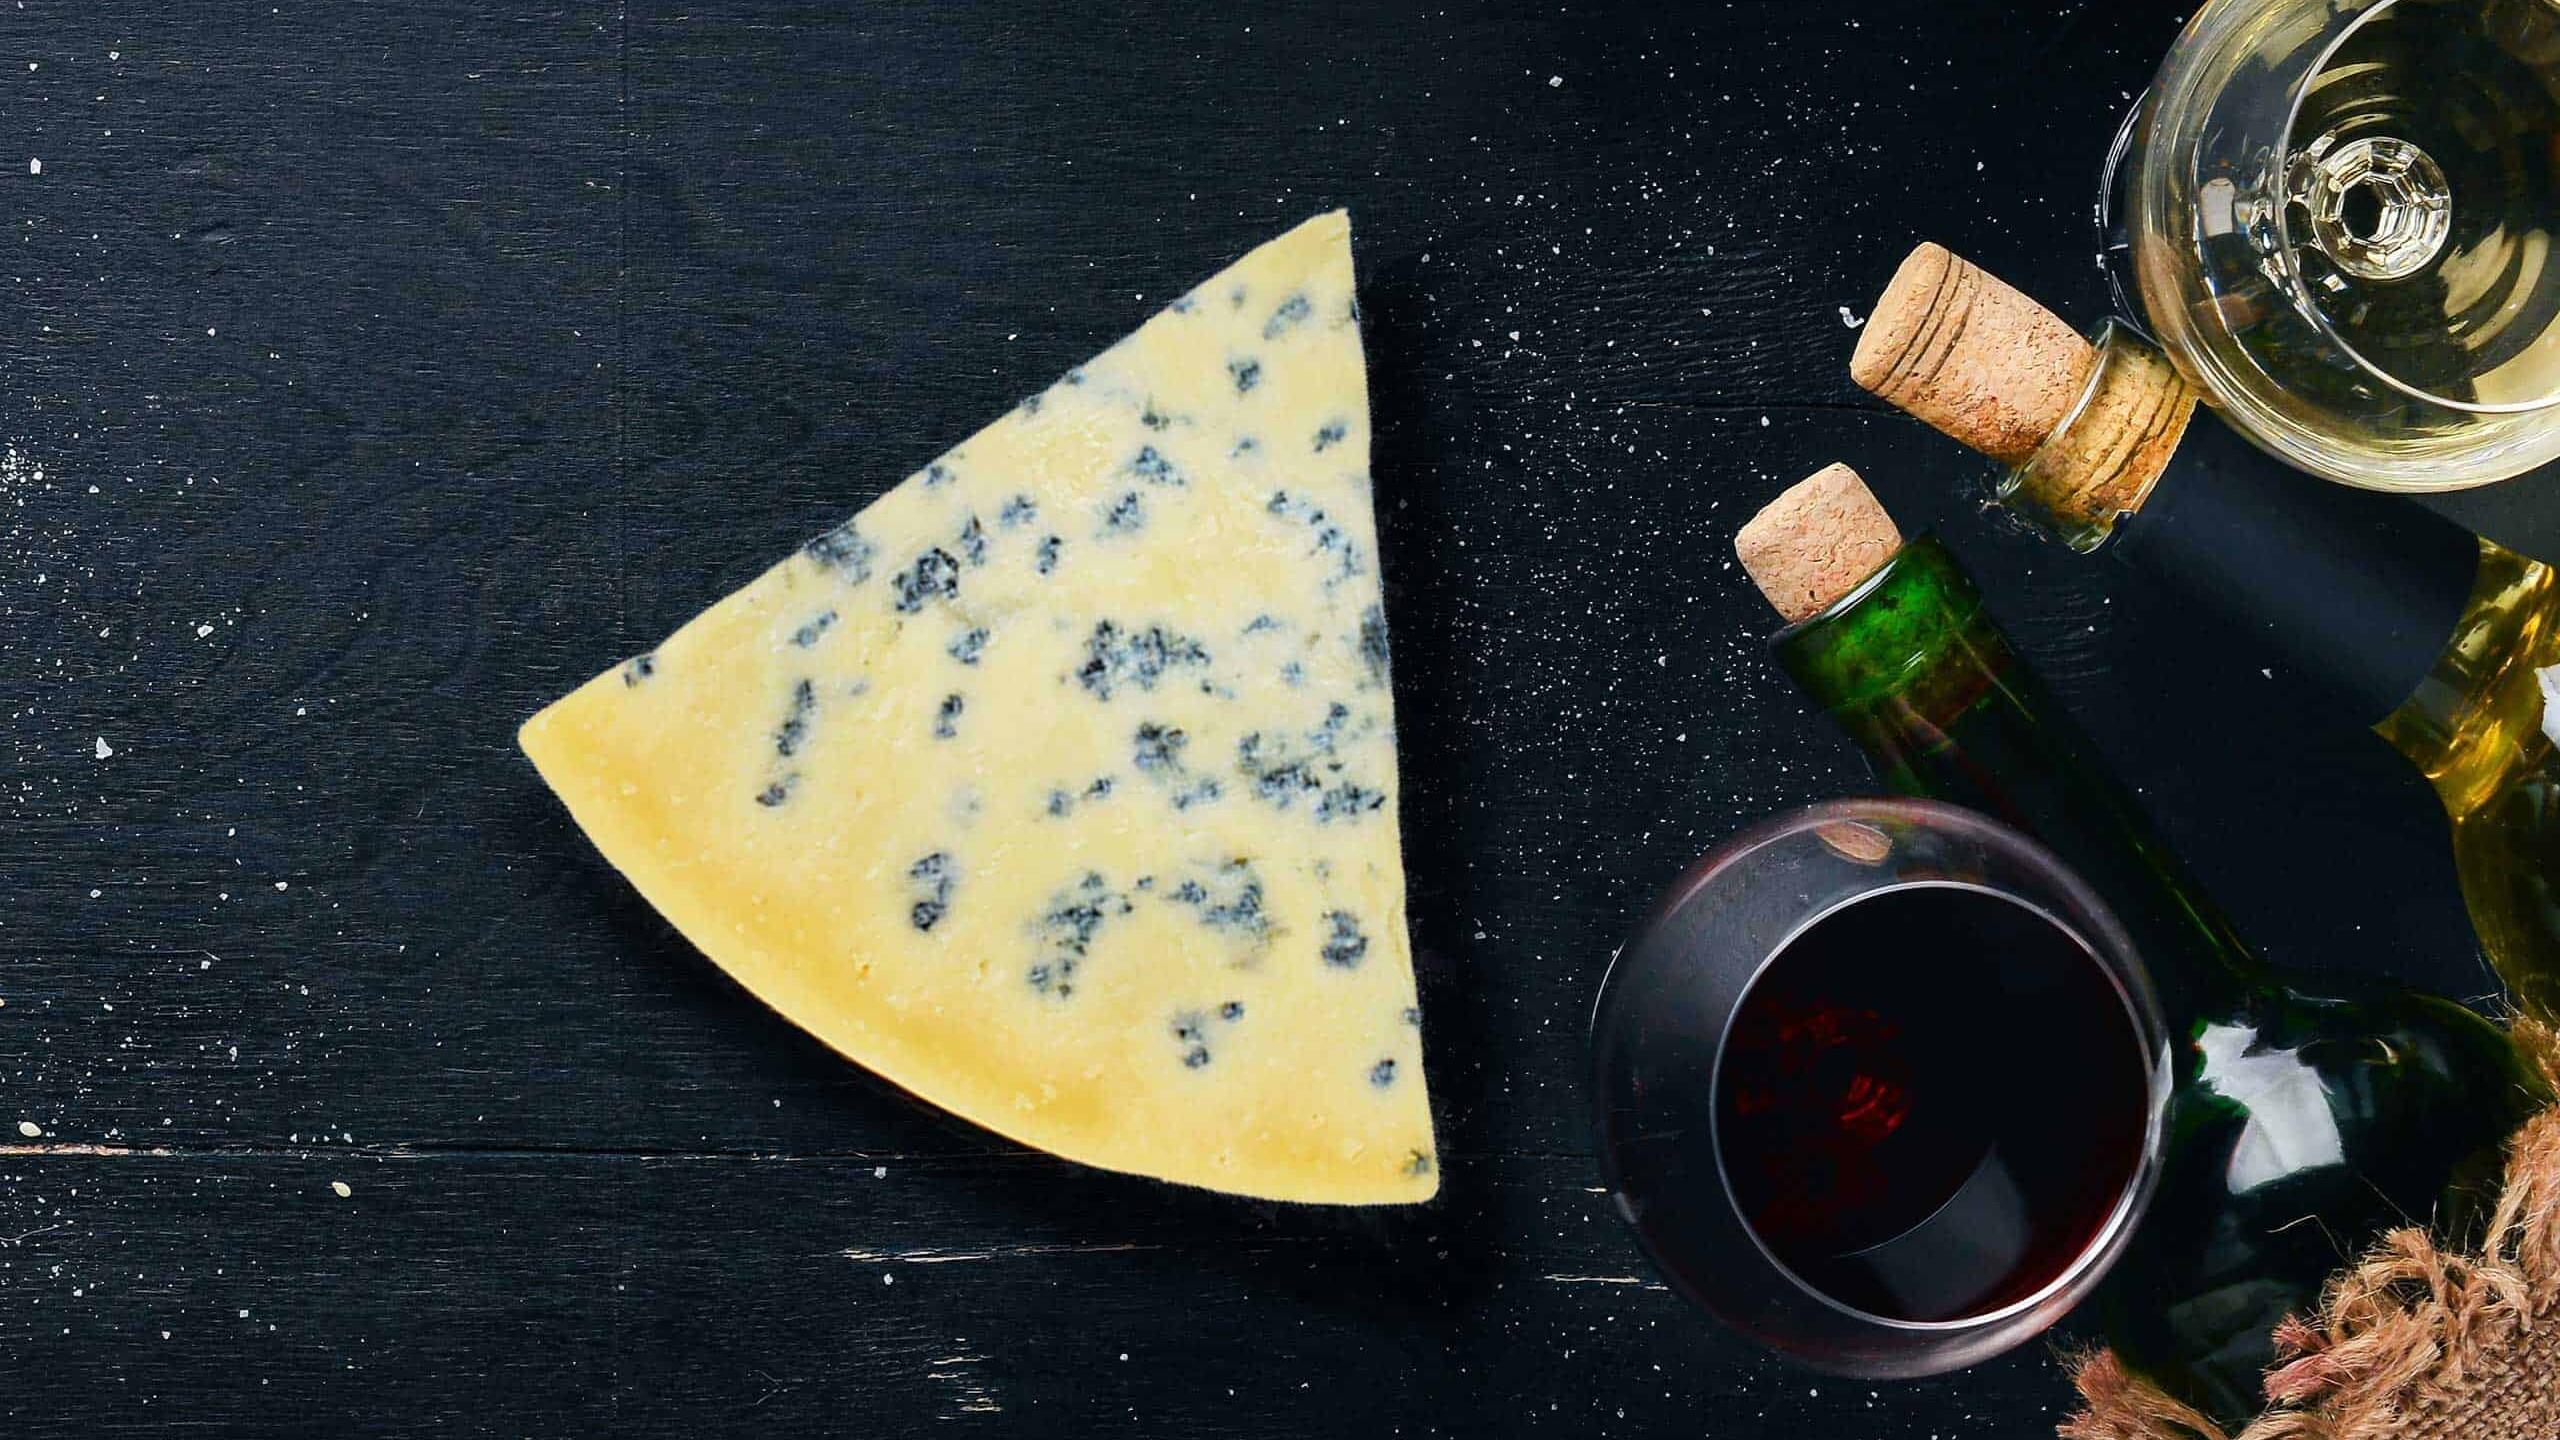 Mahoe Farmhouse Blue Cheese